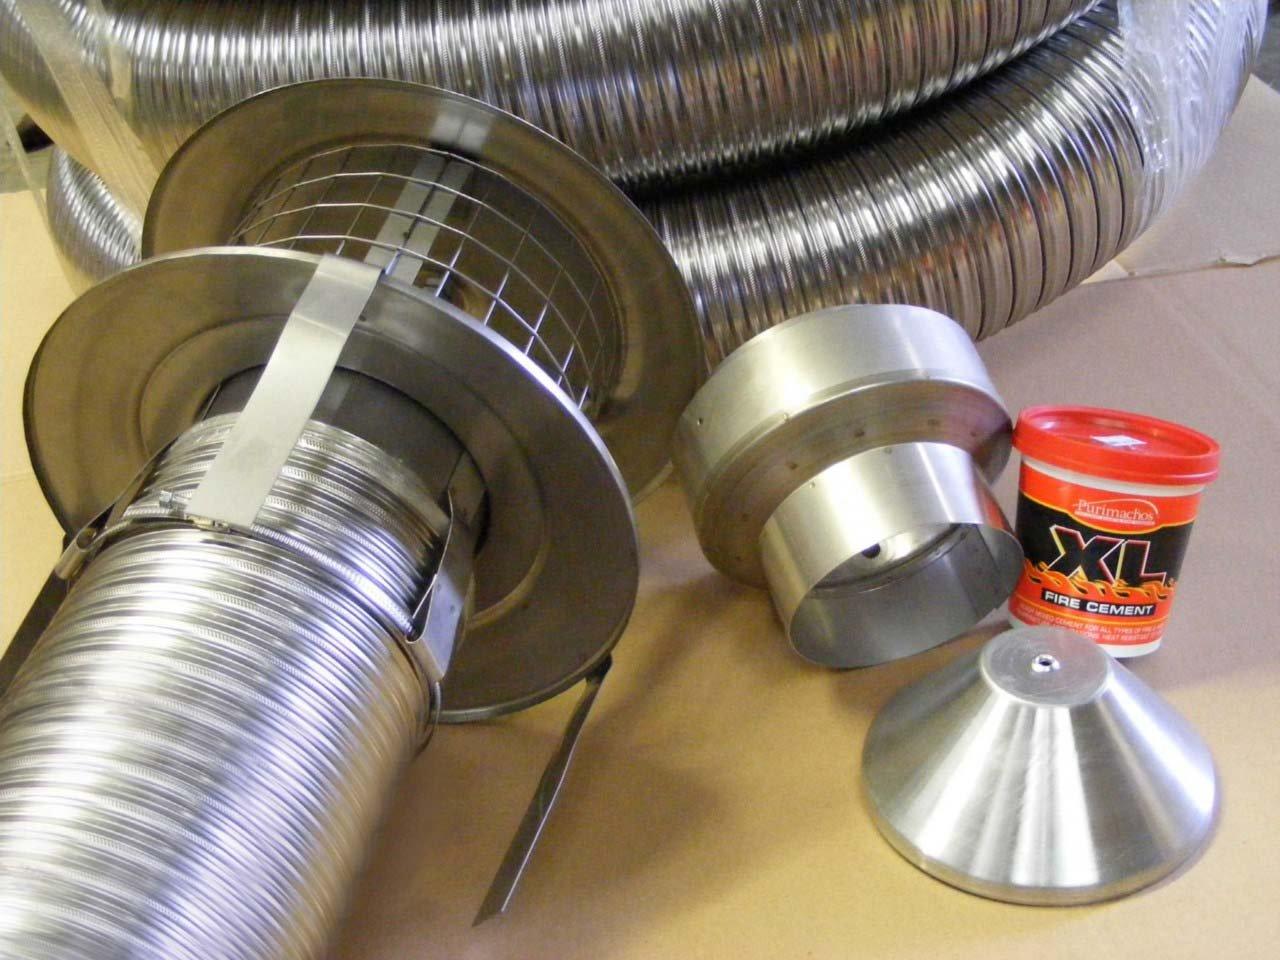 10m stainless 6 inch quality chimney flue liner easyfit kit